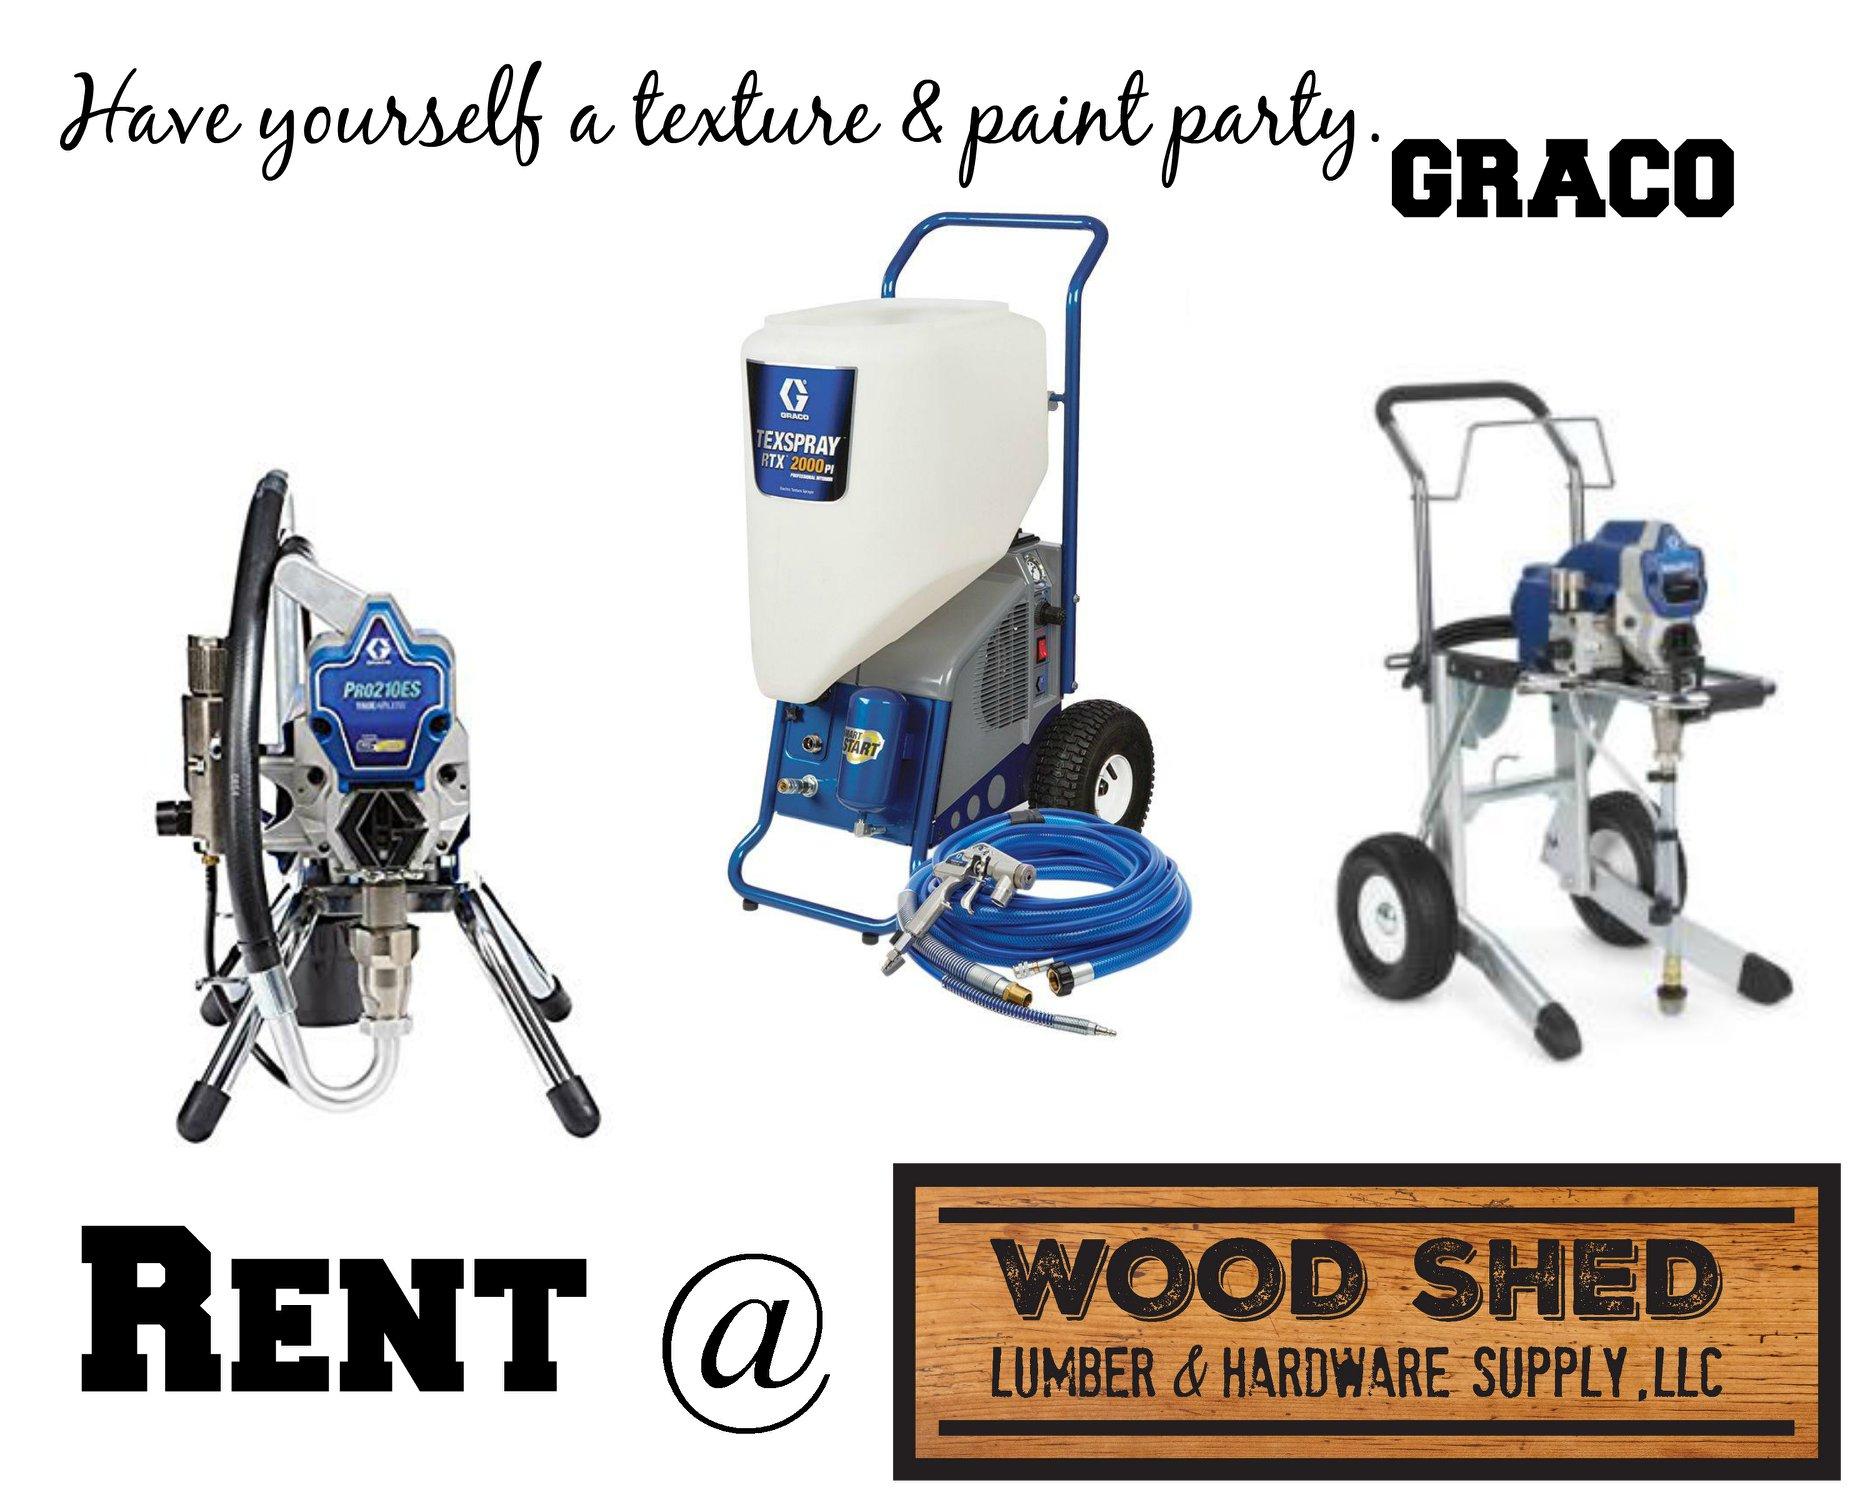 graco equipment rental